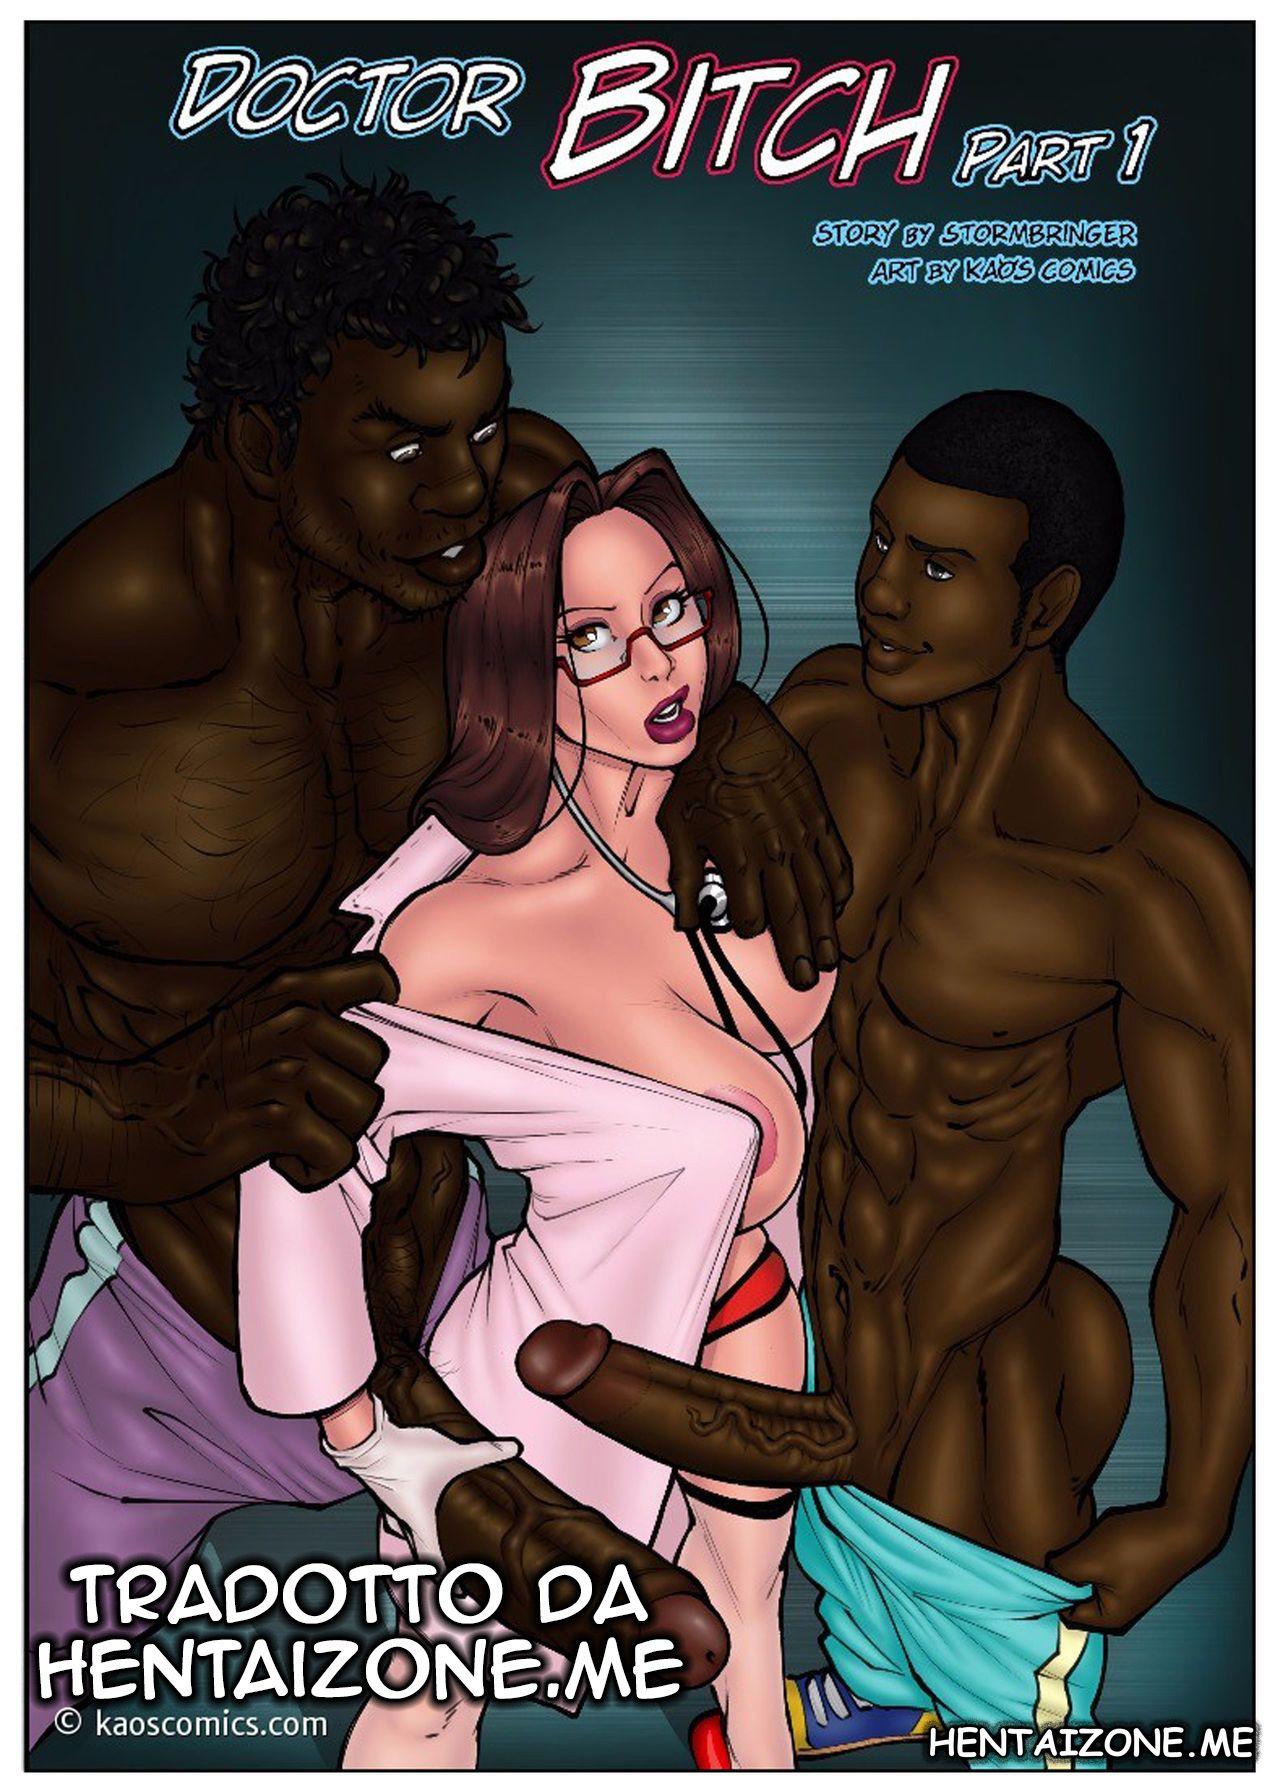 full color whitedoctor and black big cock slut nurse porno hentai ita xxxx